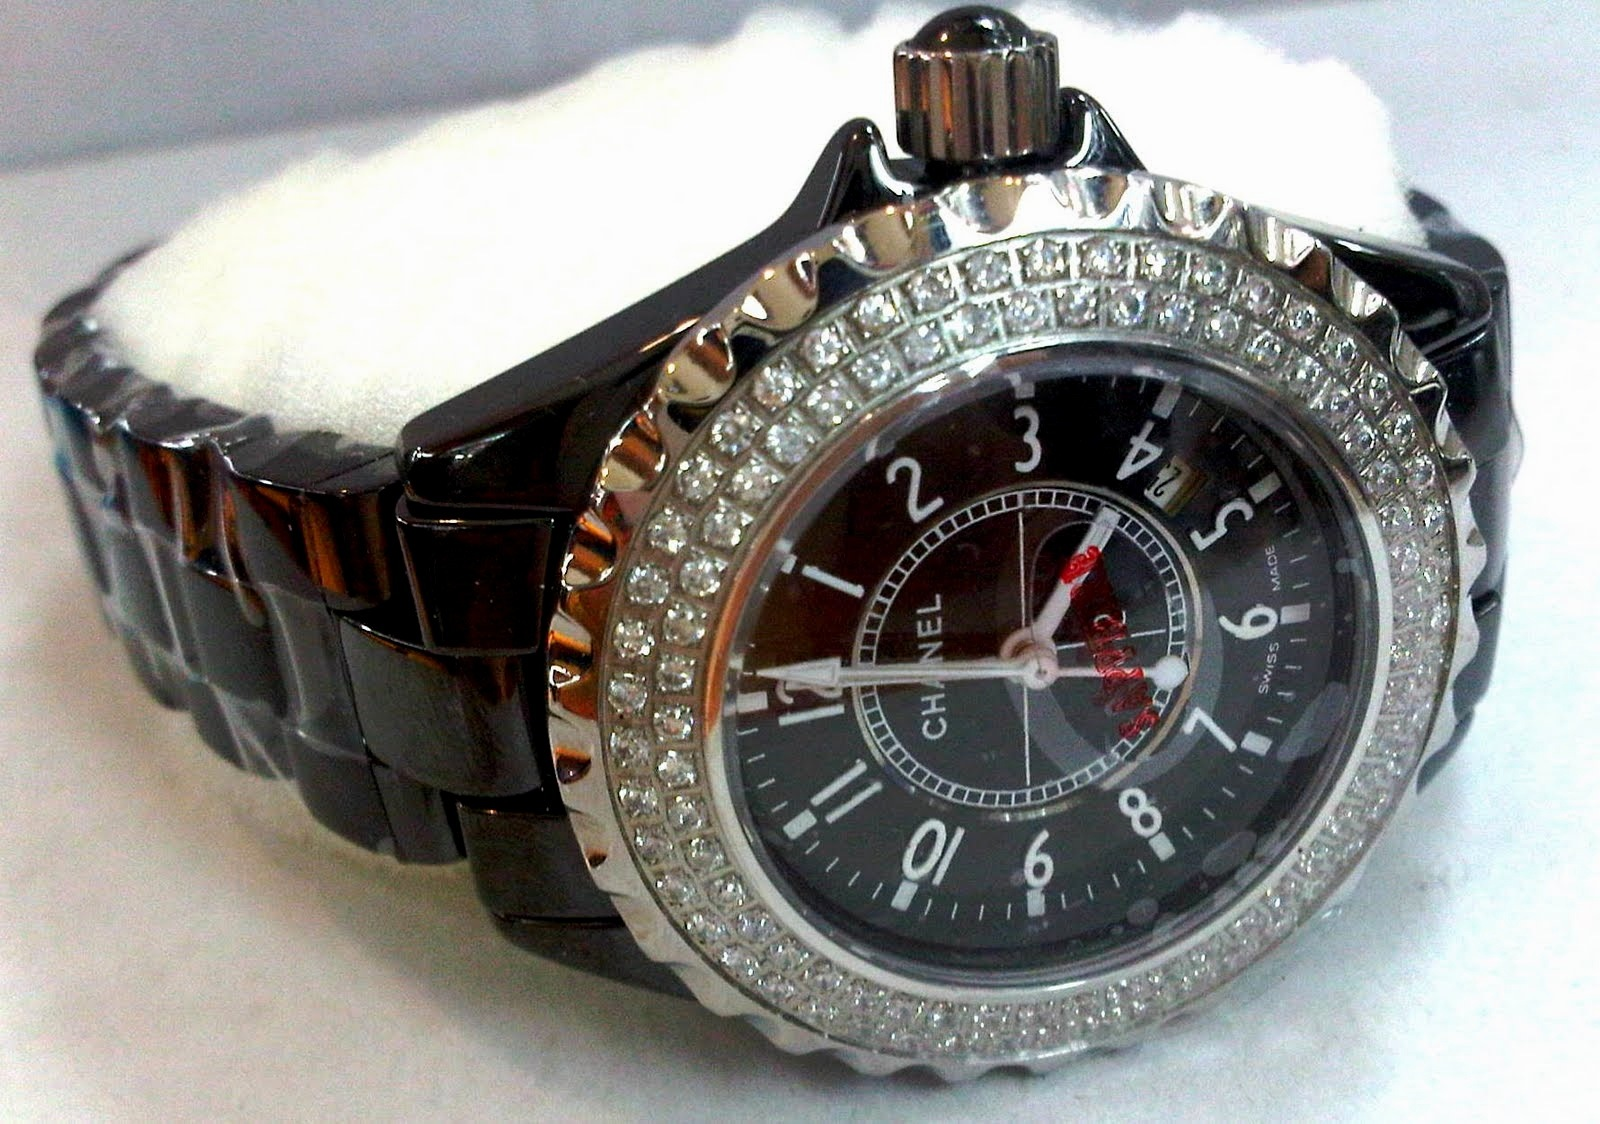 jam tangan otomatis on JAM TANGAN GROSIR | JAM TANGAN | JUAL JAM TANGAN | JAM TANGAN KW | JAM ...